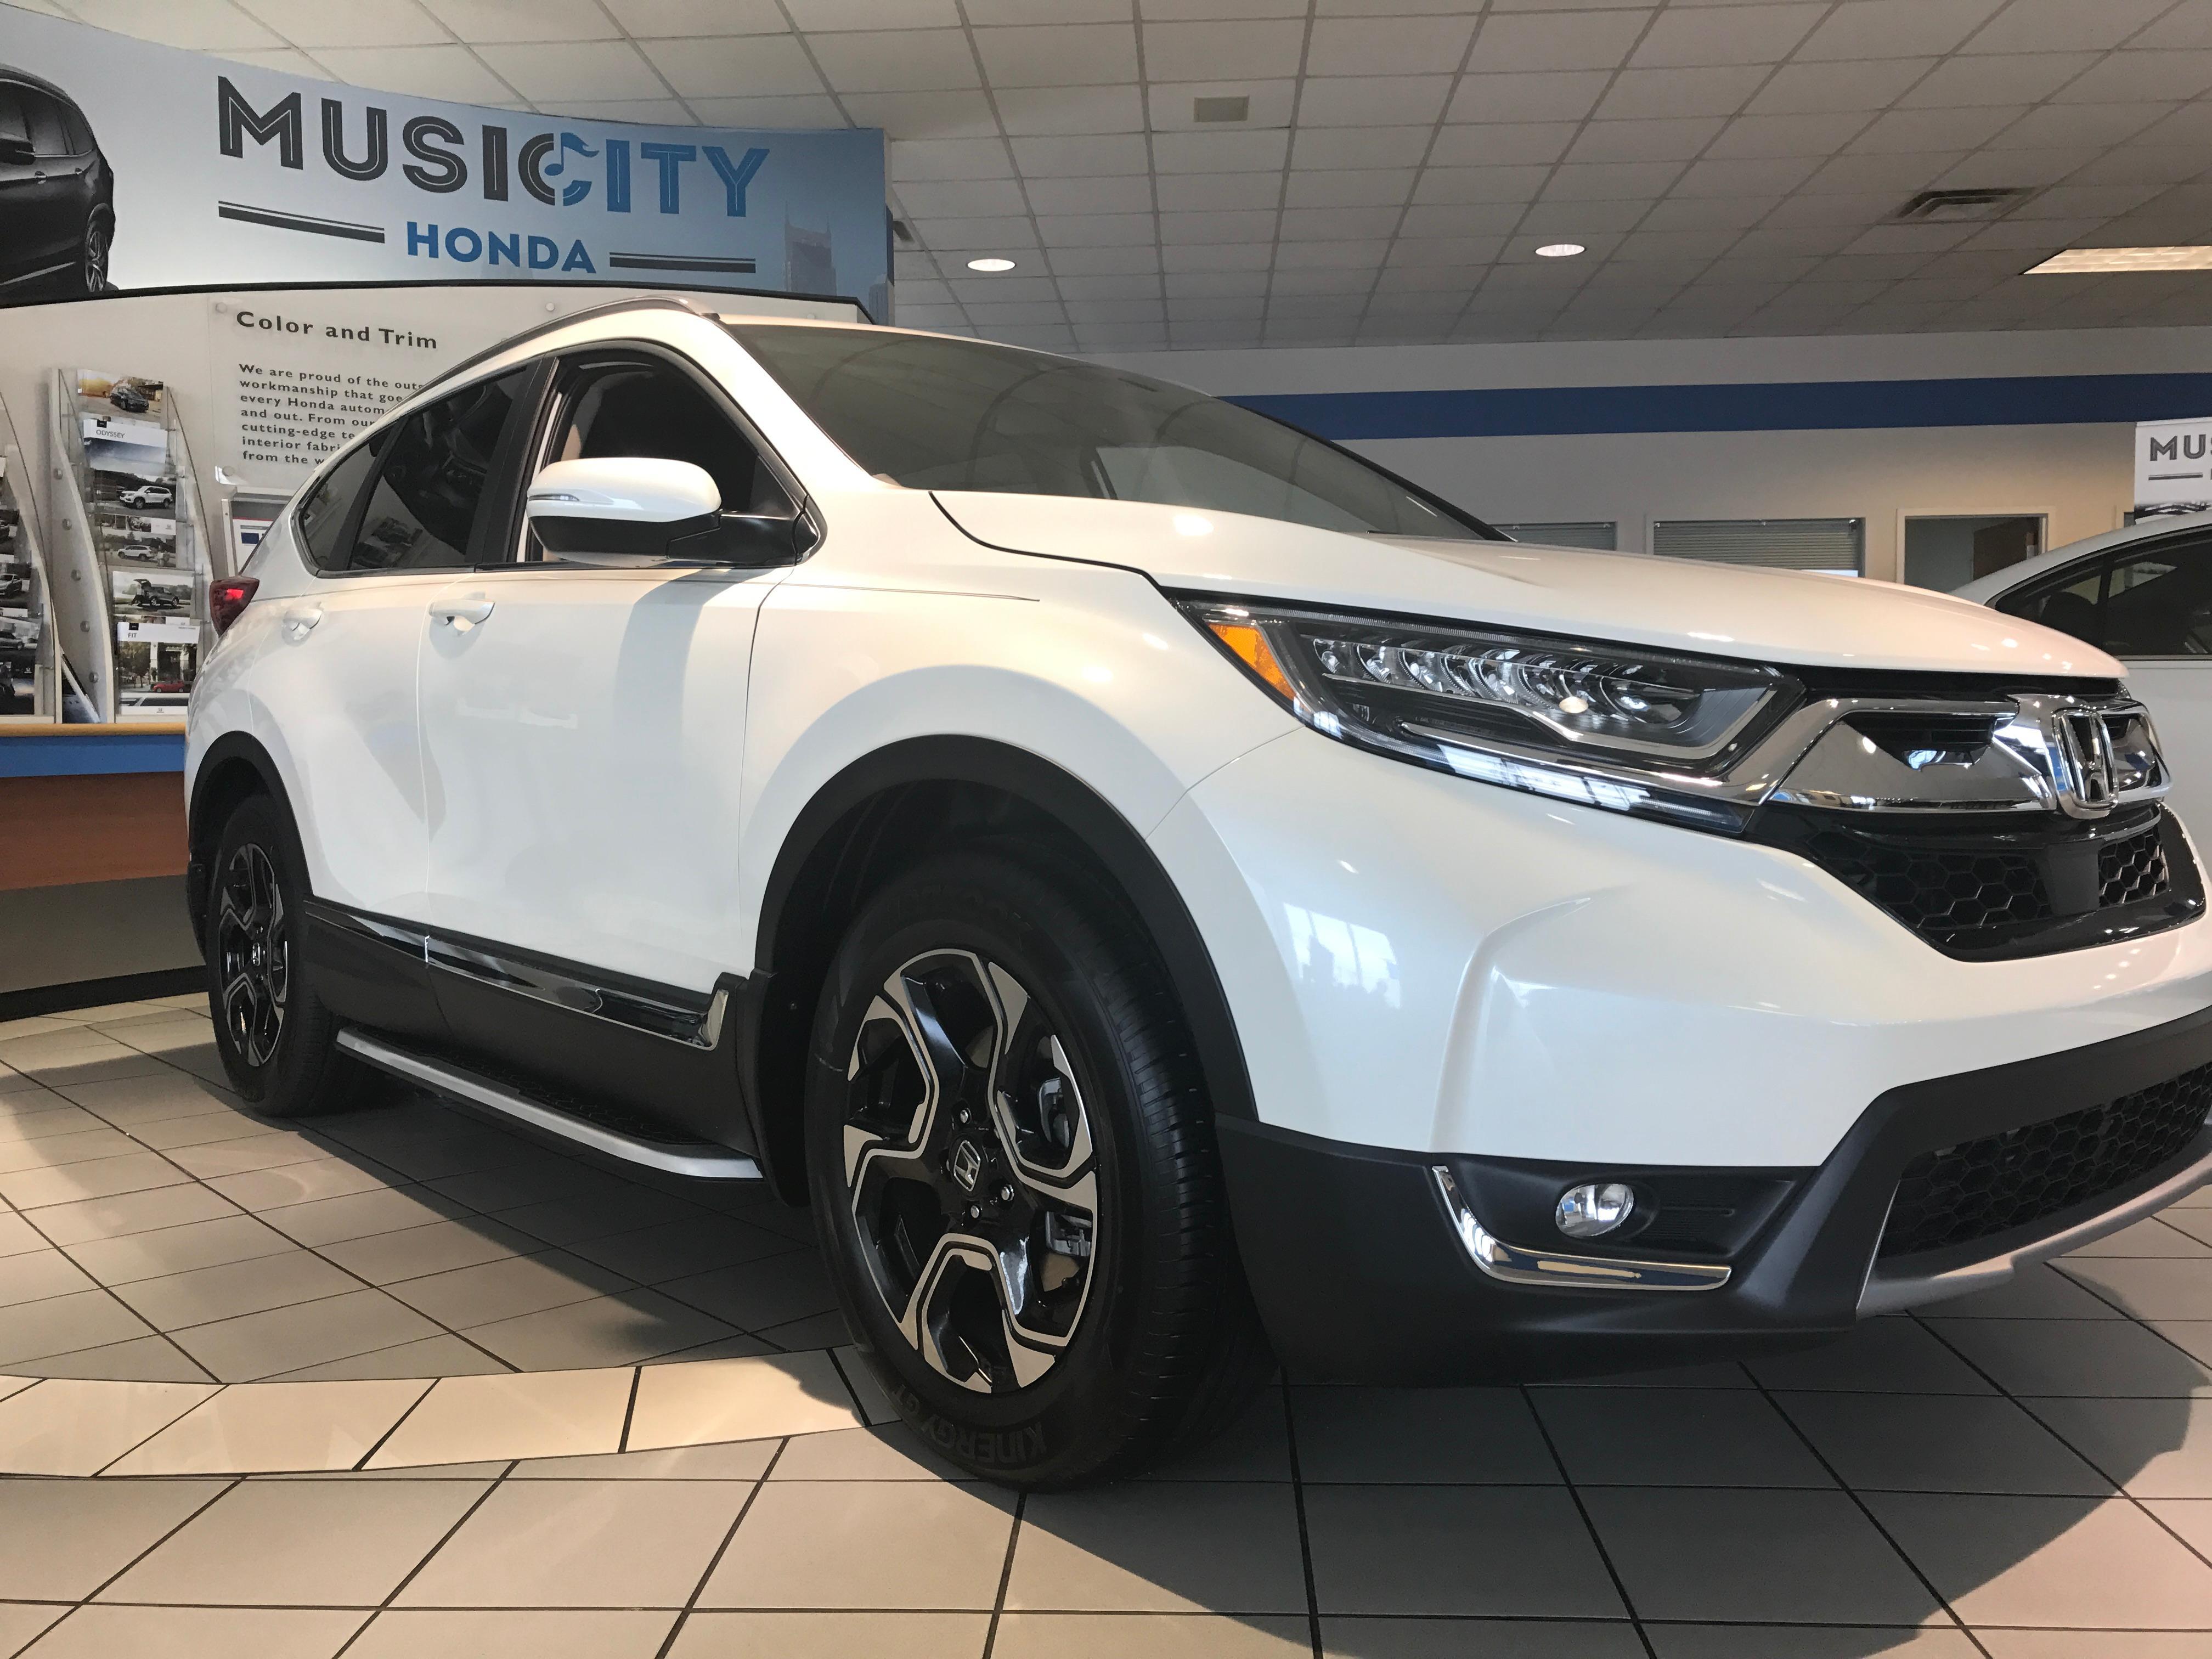 Music City Honda - Madison, TN